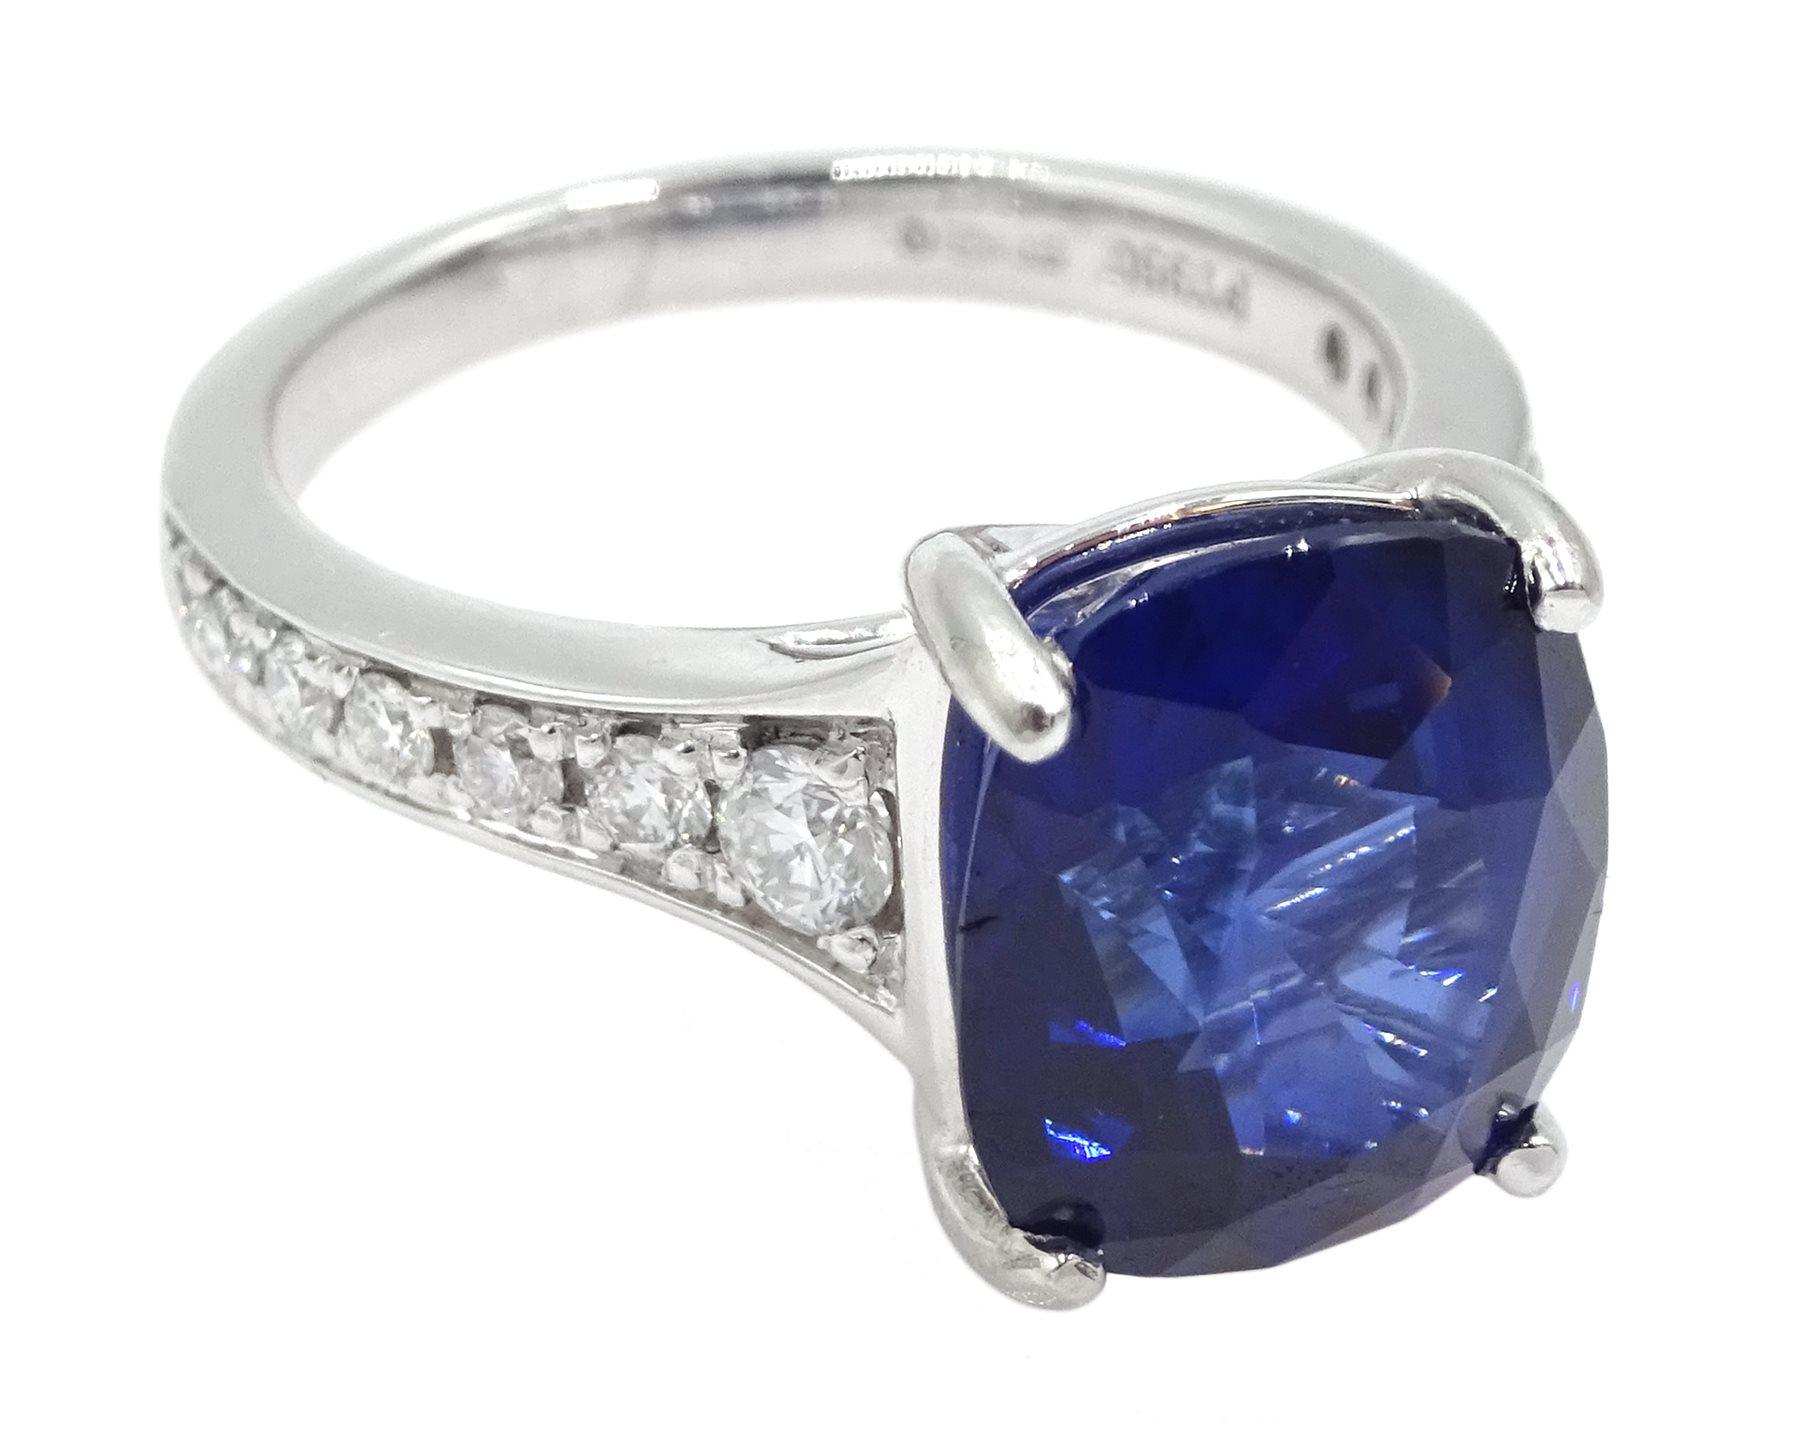 Platinum cushion cut Ceylon sapphire ring - Image 3 of 6